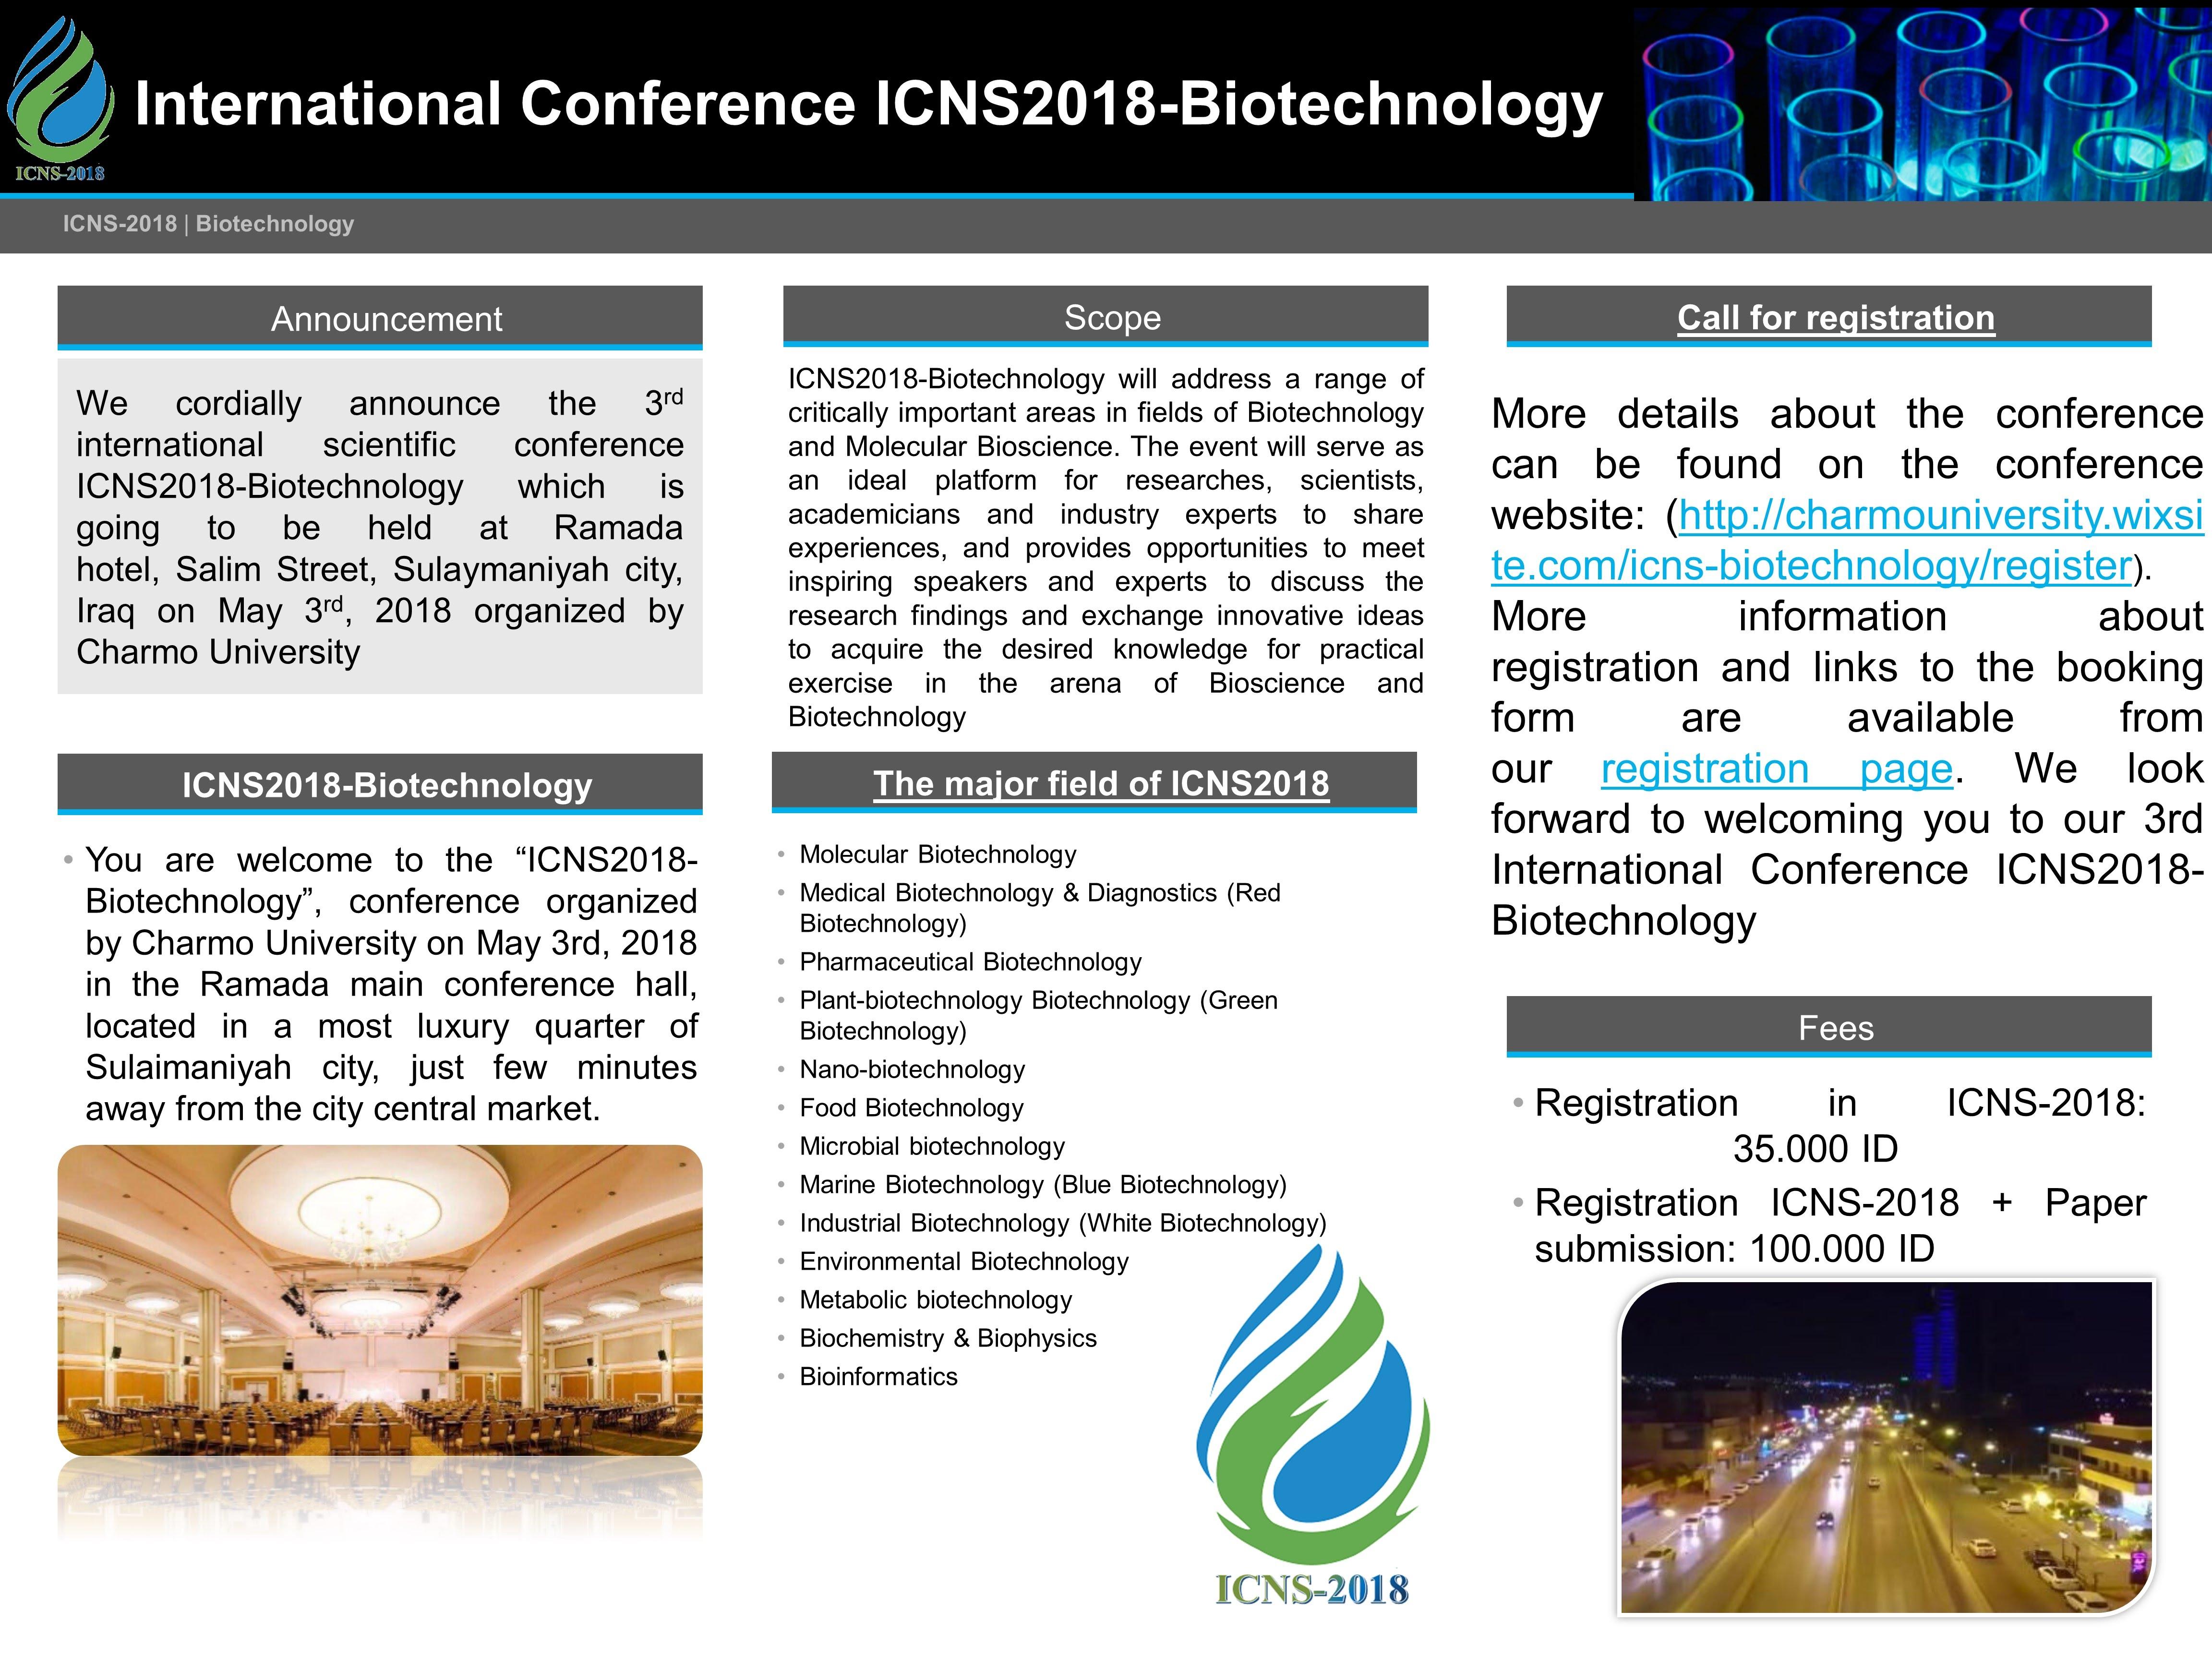 http://charmouniversity.wixsite.com/icns-biotechnology/register